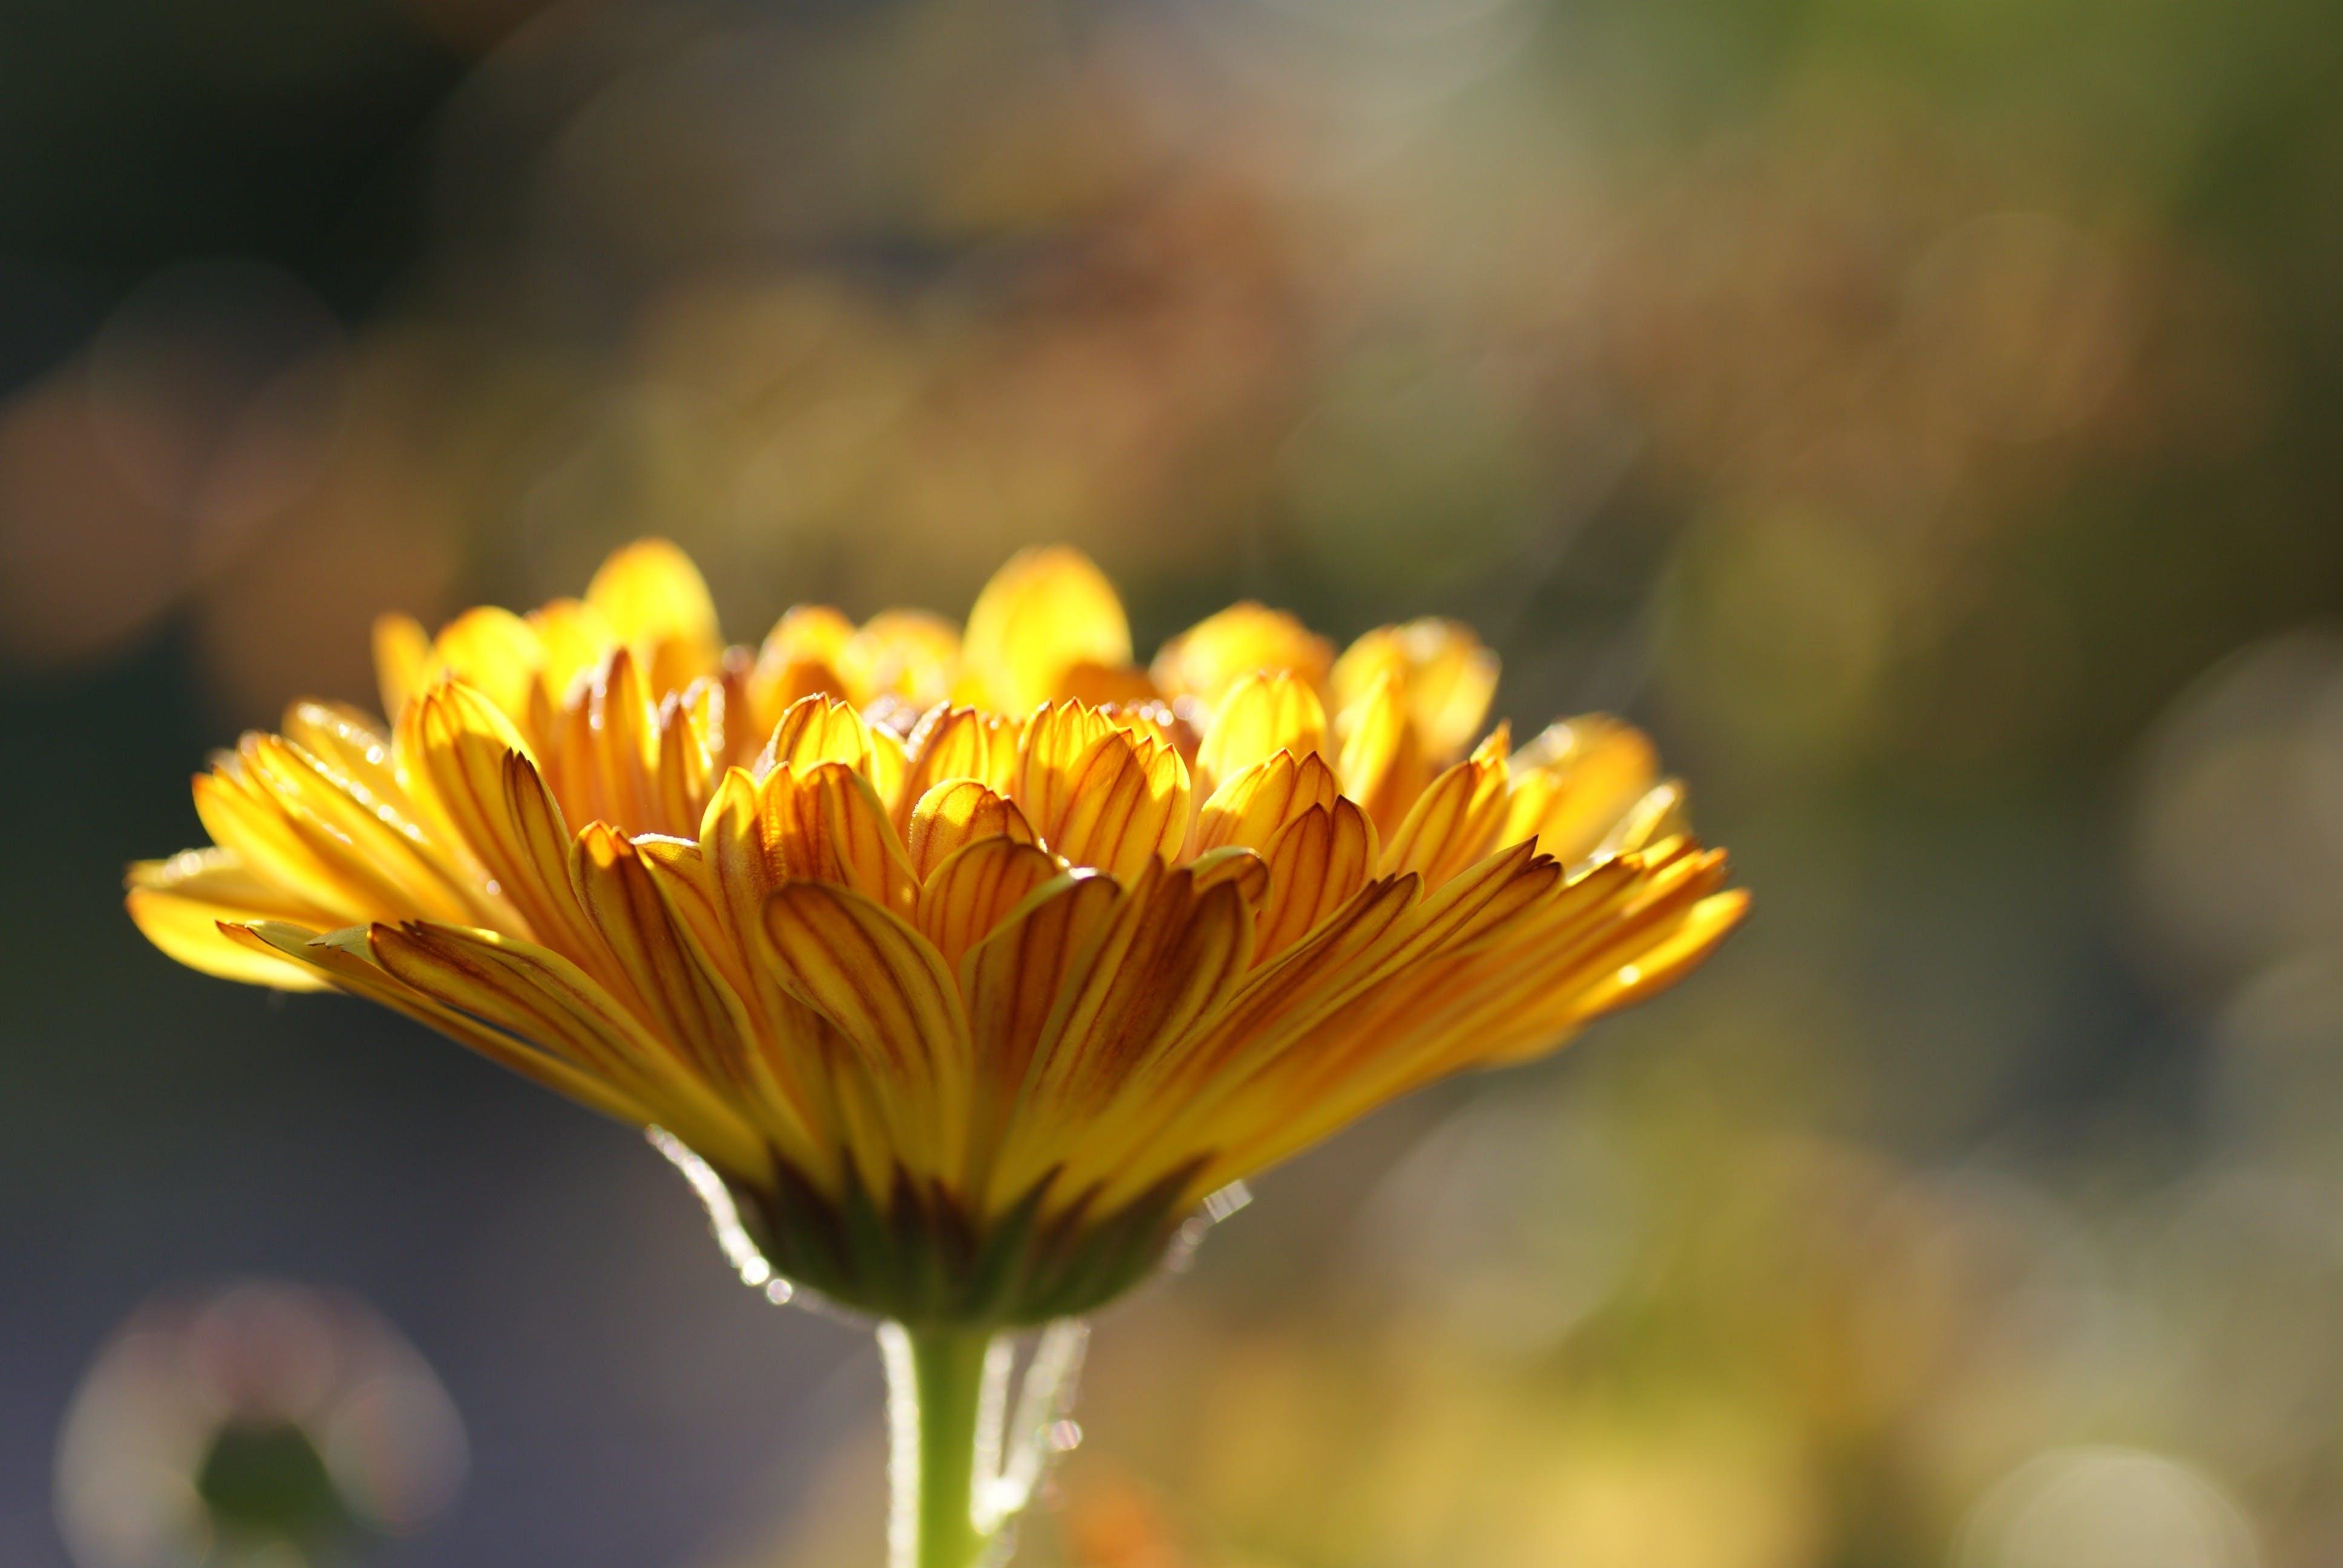 Kostenloses Stock Foto zu pflanze, blume, makro, blühen